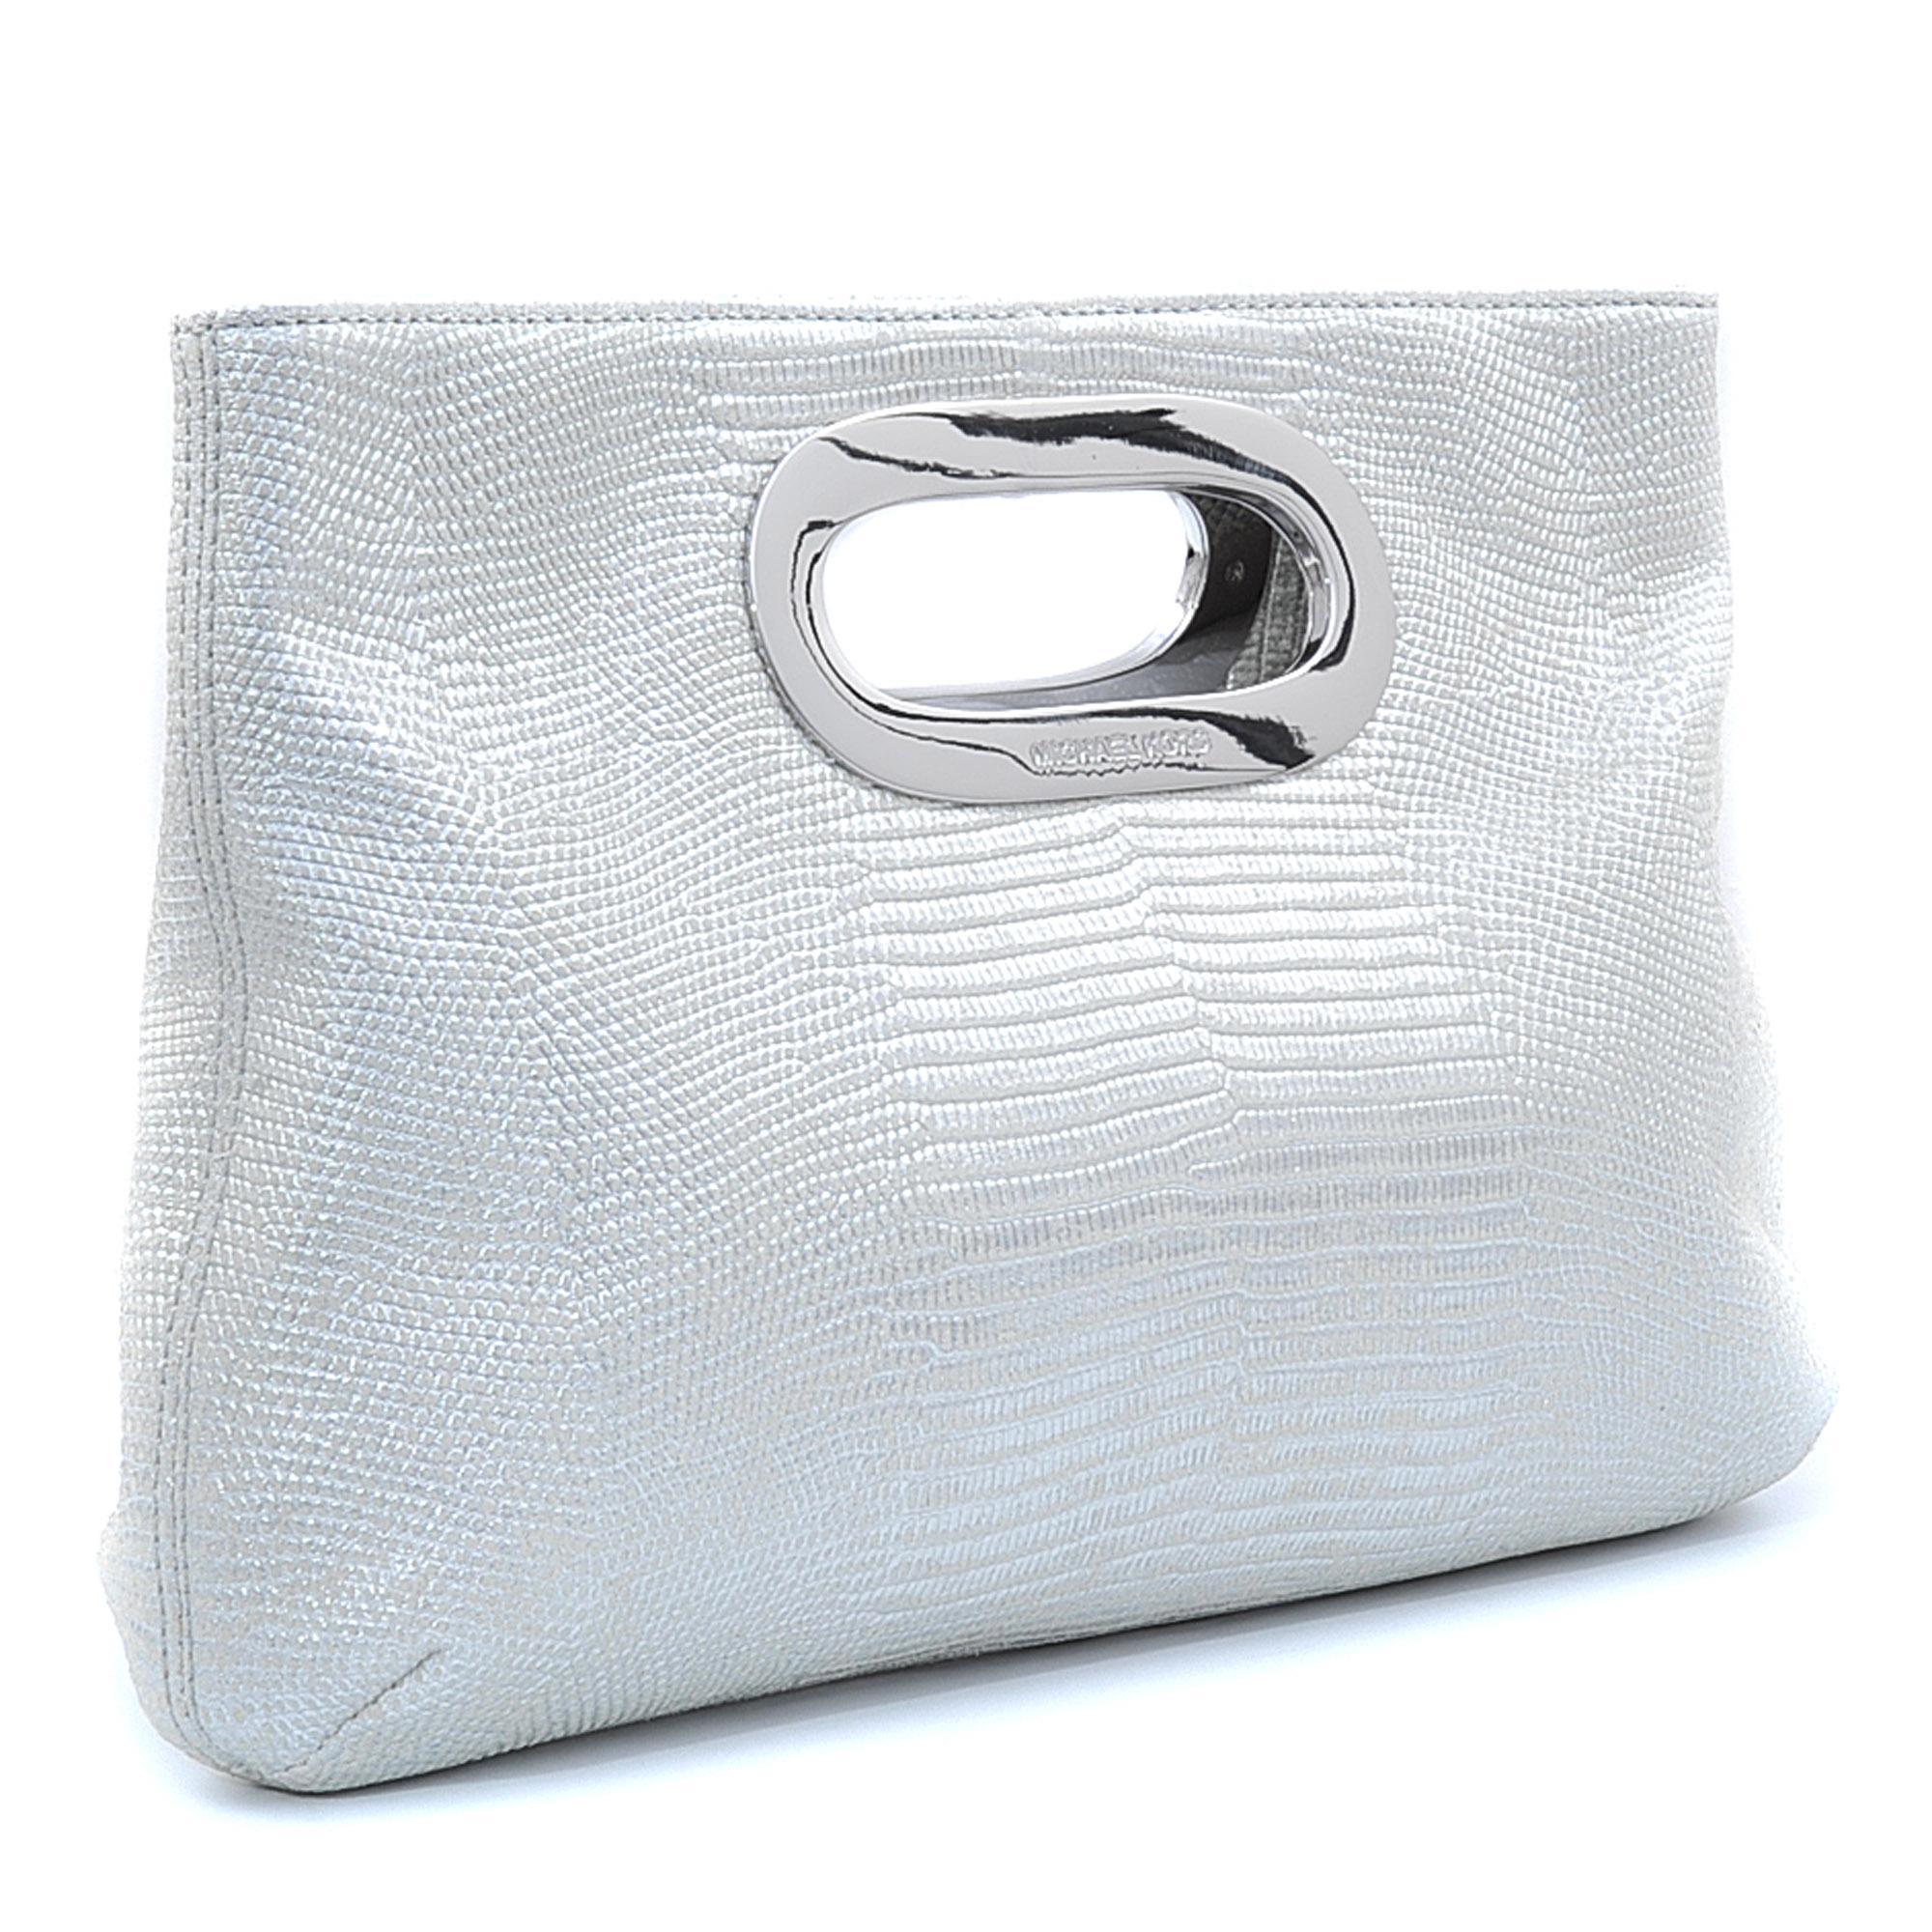 michael kors berkley clutch in silver lyst. Black Bedroom Furniture Sets. Home Design Ideas